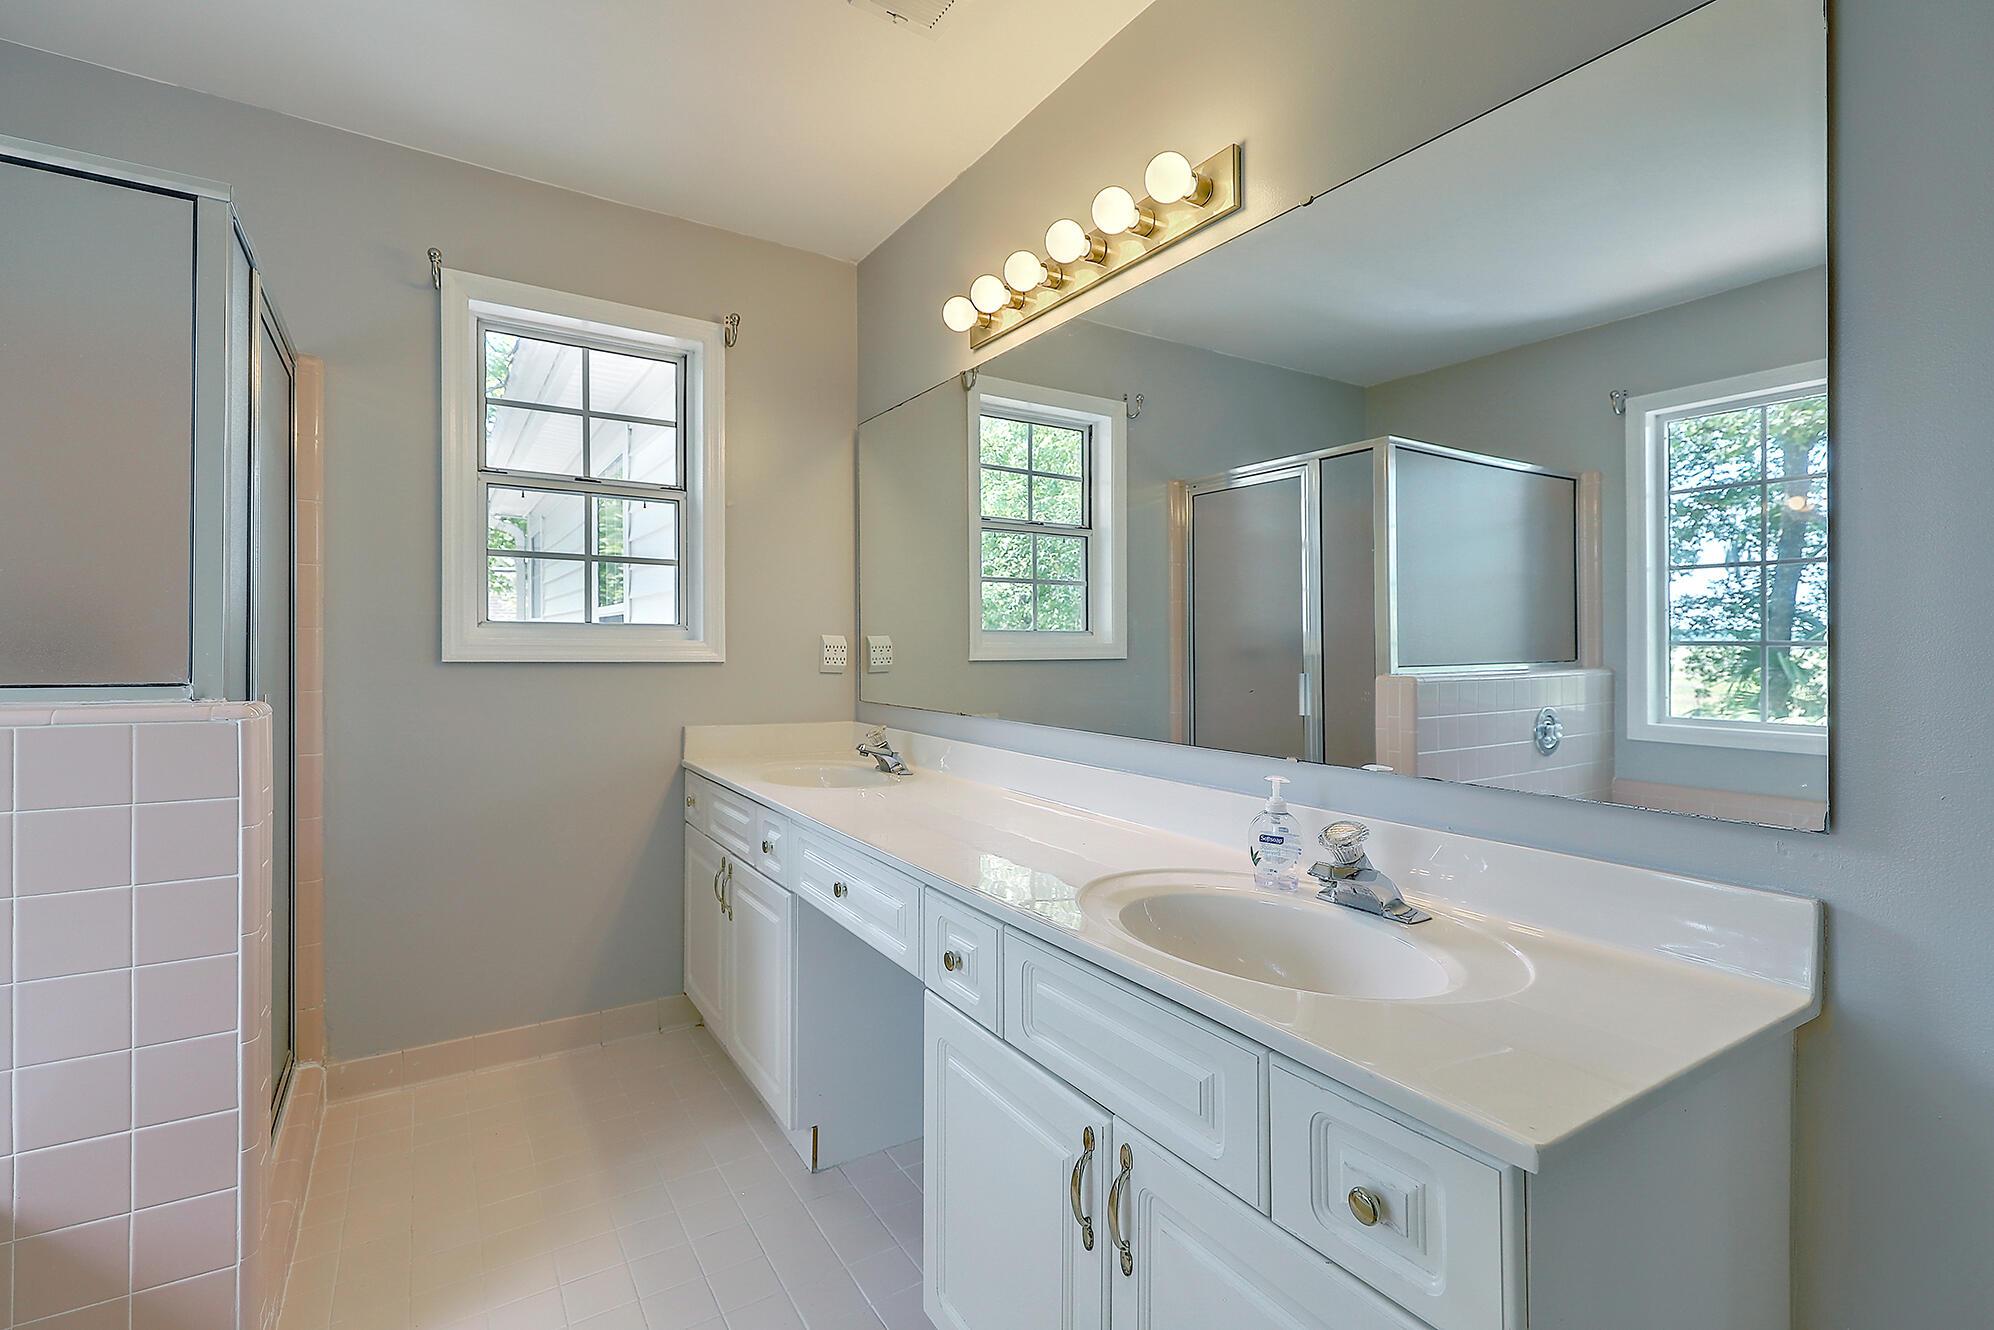 Appian Landing Homes For Sale - 8262 Longridge, North Charleston, SC - 1